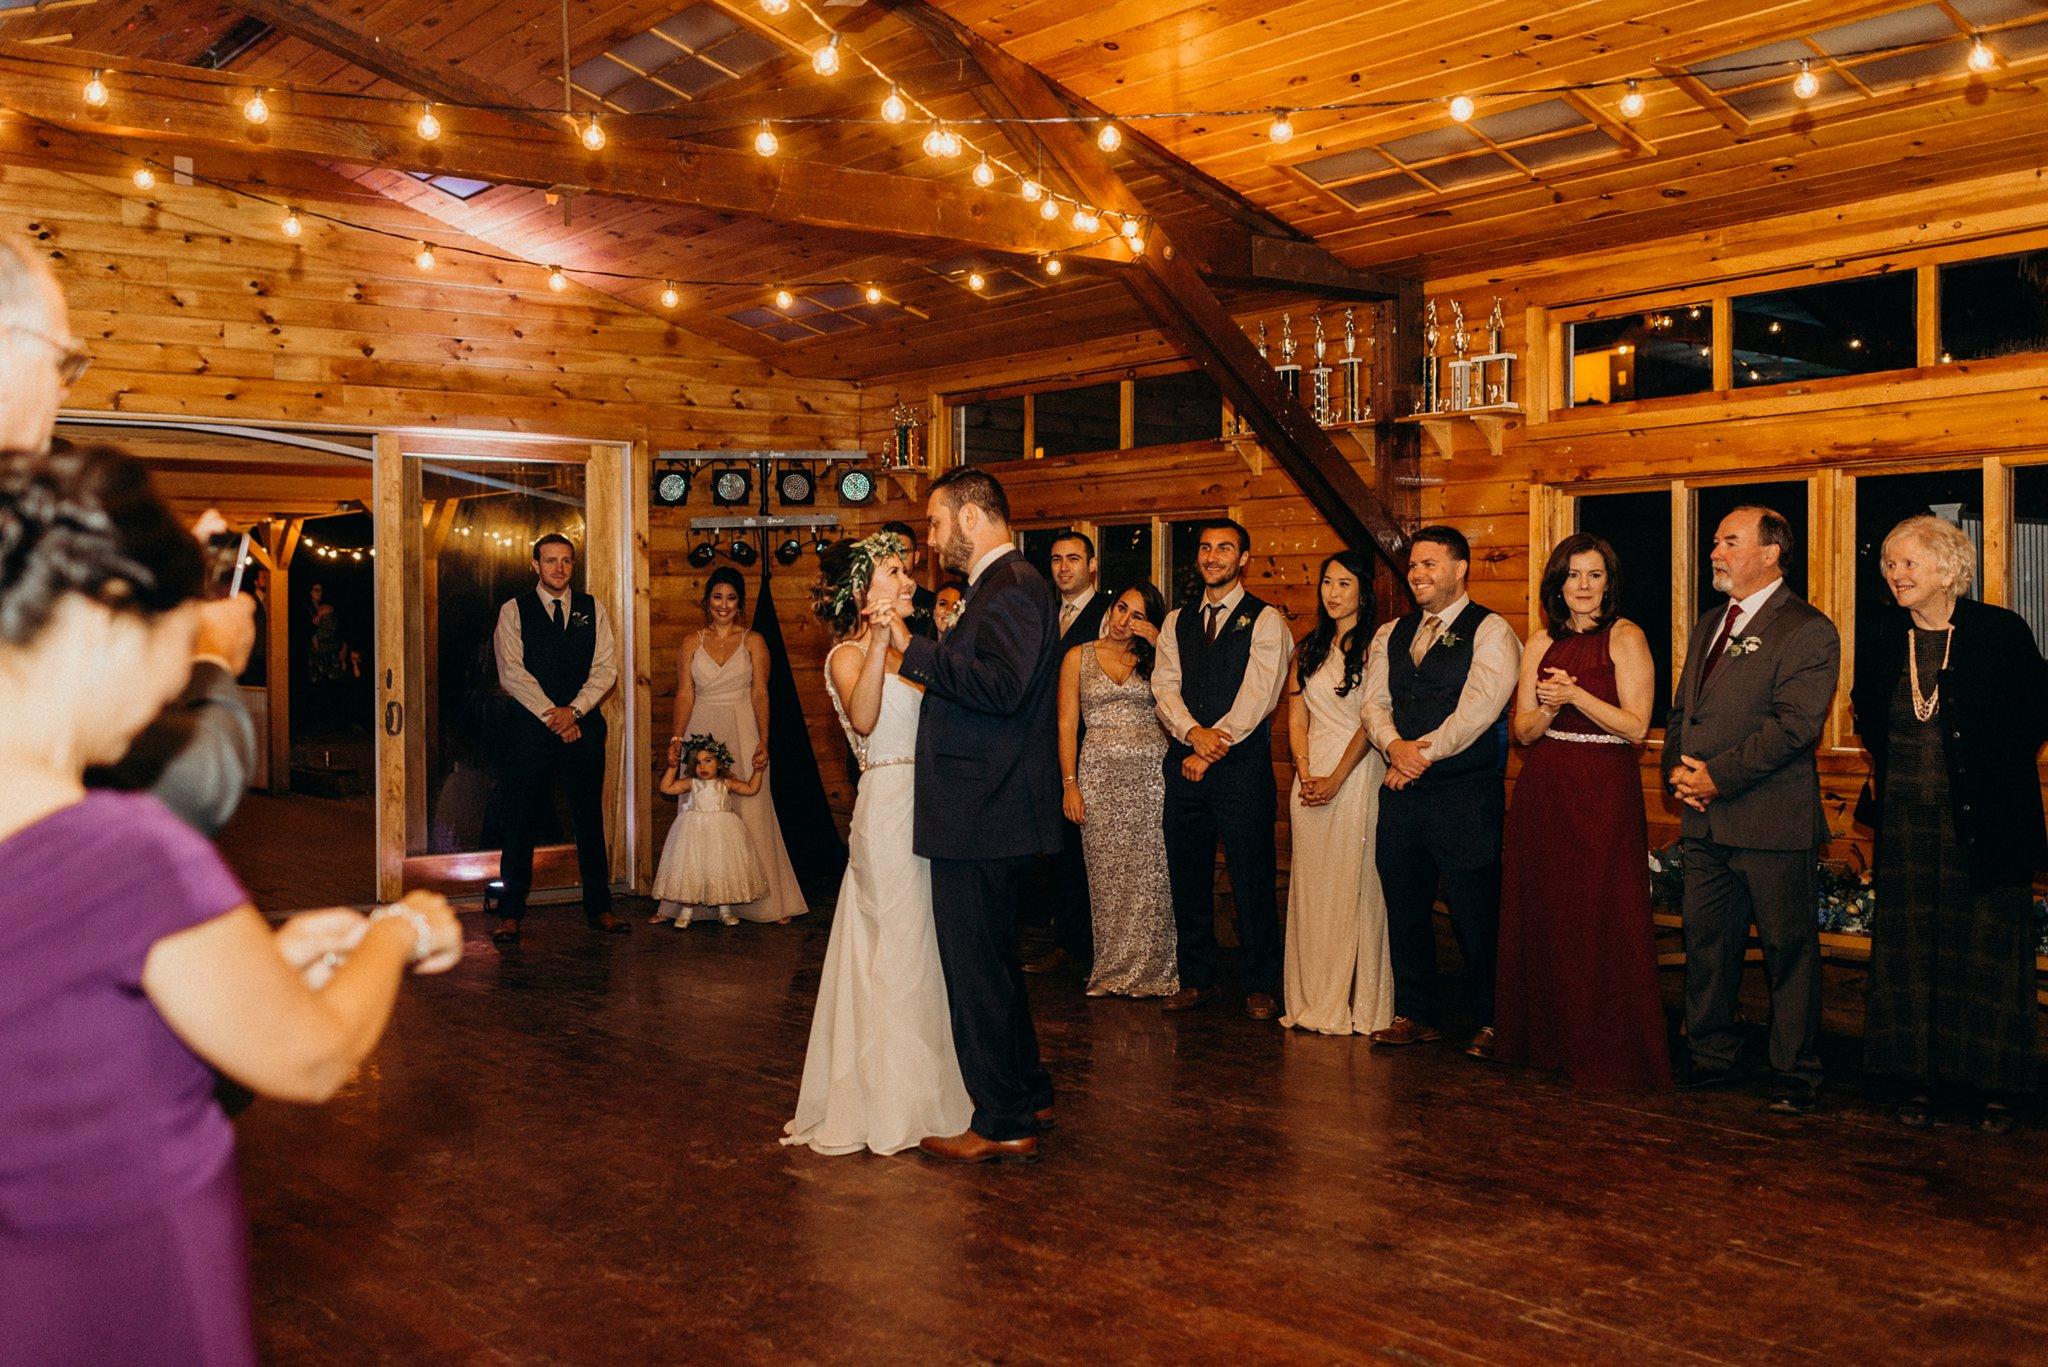 kaihla_tonai_intimate_wedding_elopement_photographer_6669.jpg